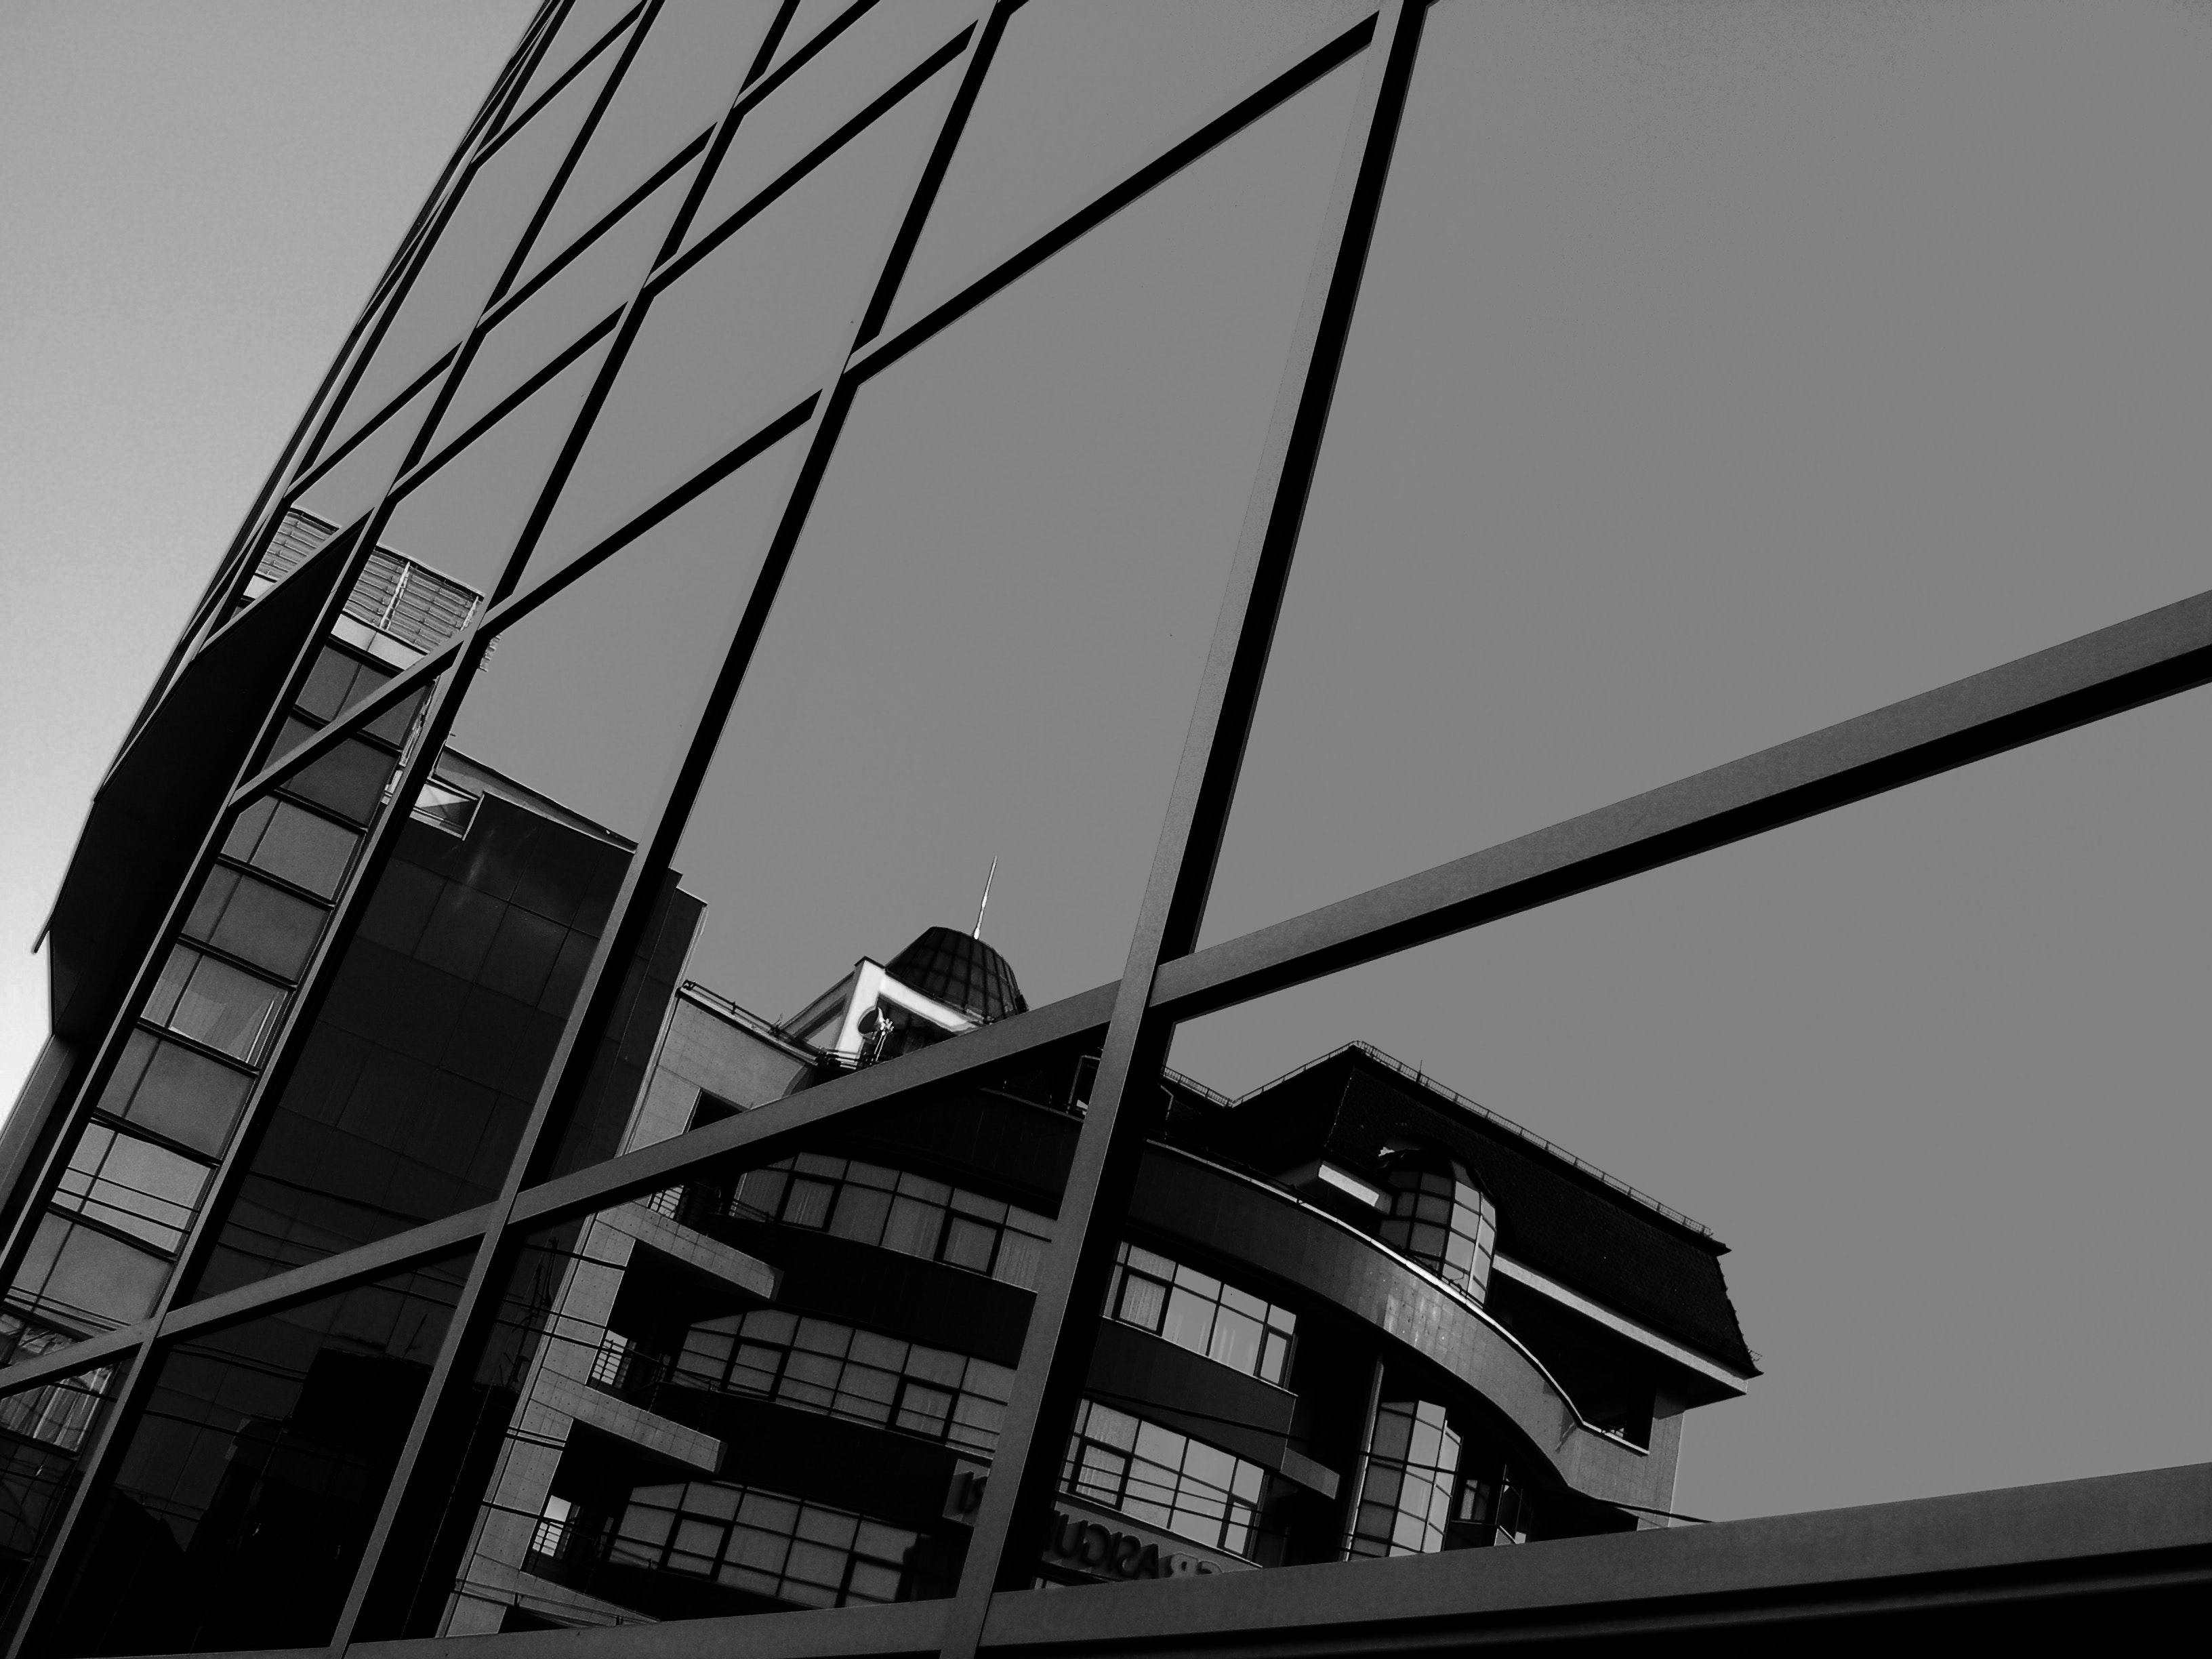 architecture black and white black and white